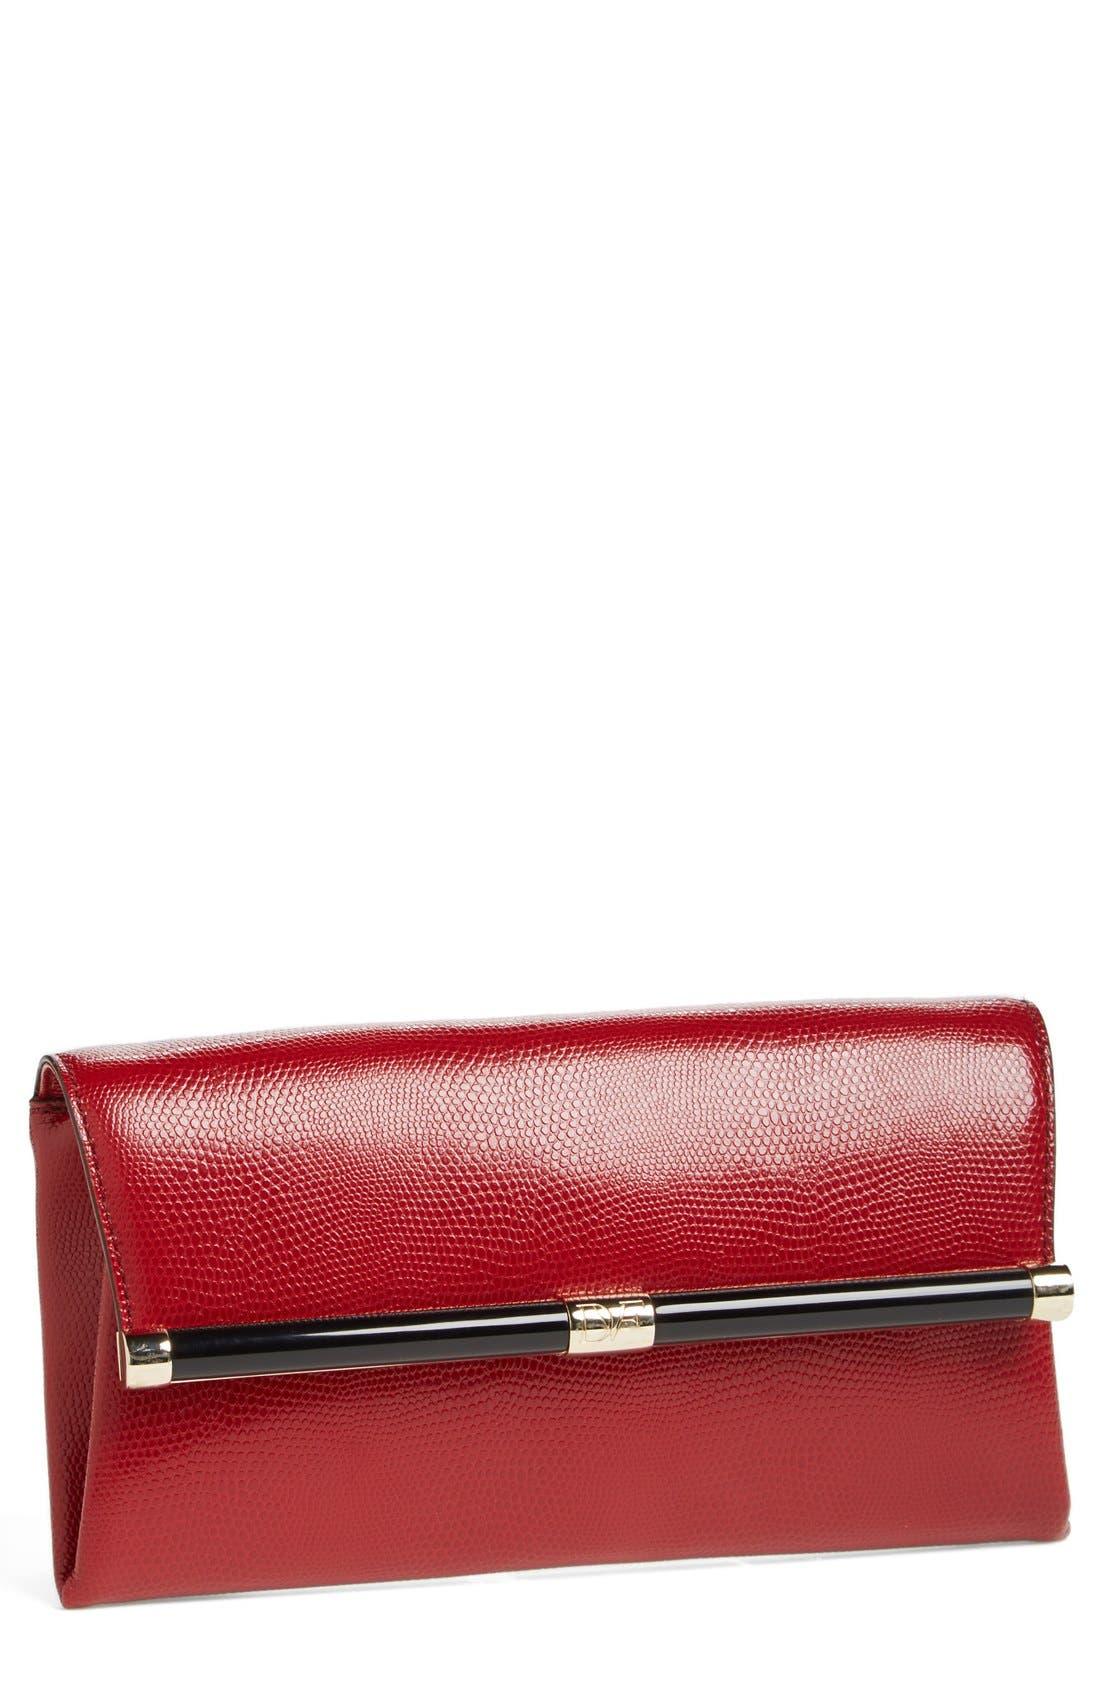 Main Image - Diane von Furstenberg '440' Embossed Leather Envelope Clutch